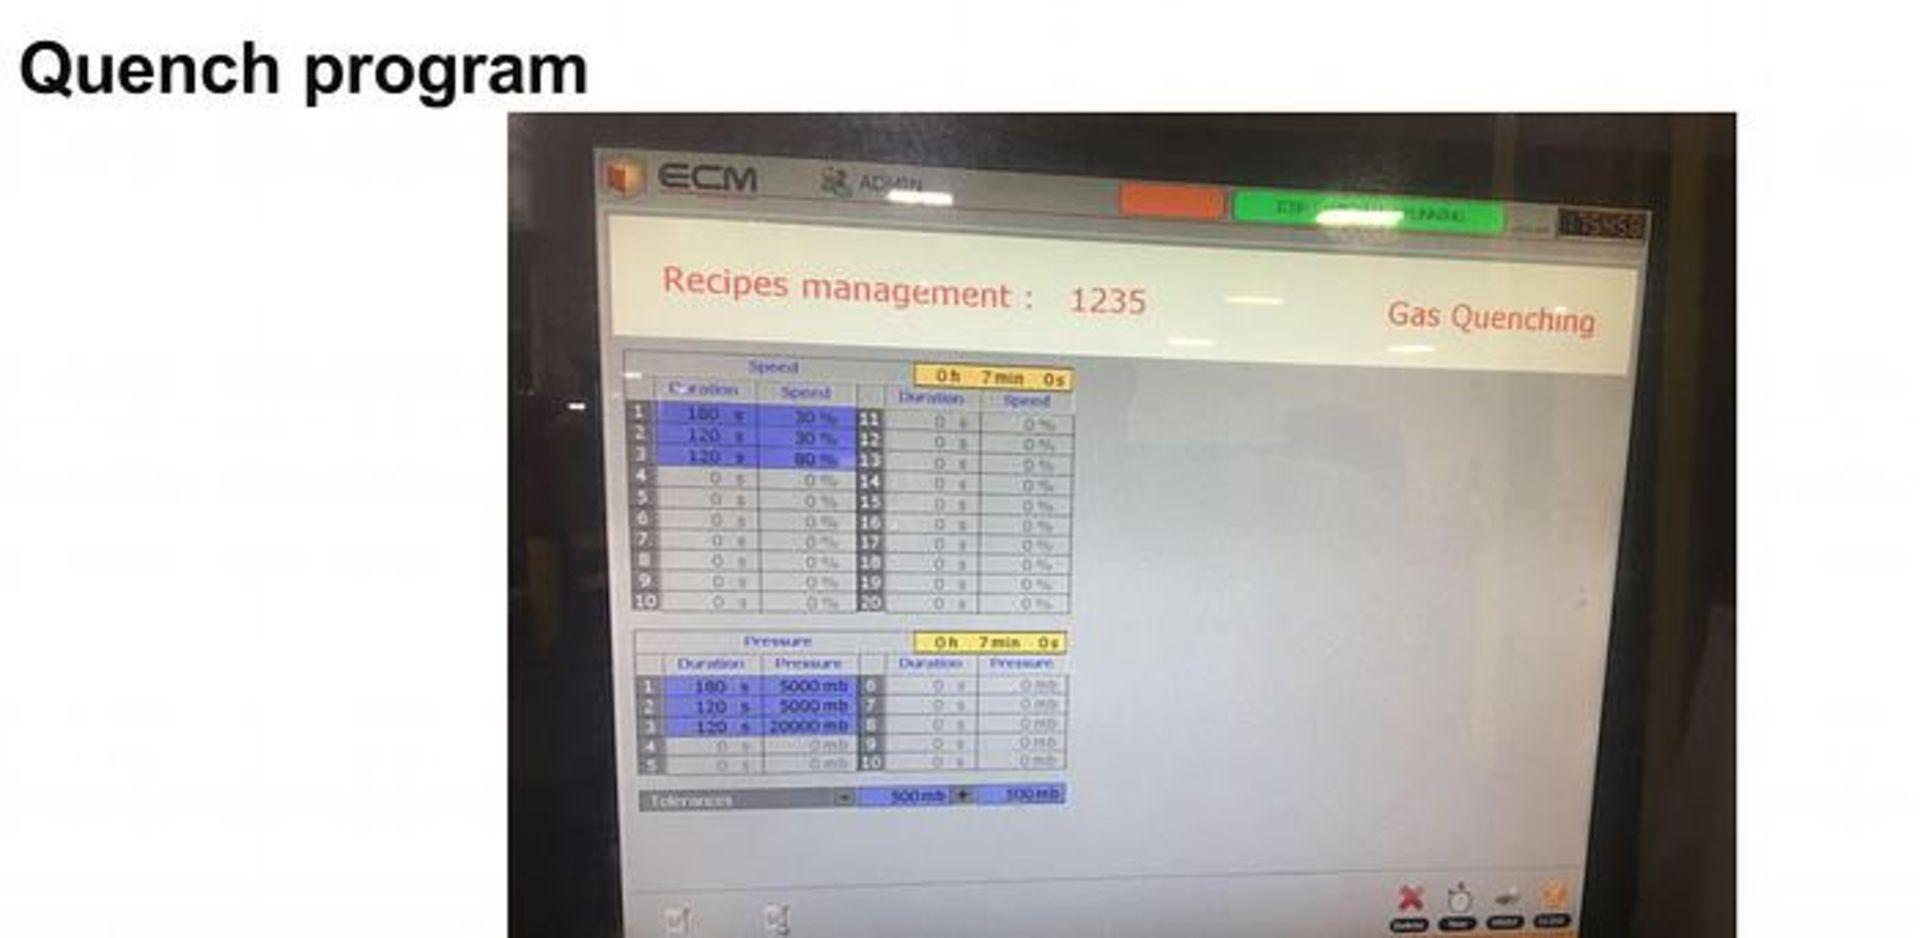 ECM TECHNOLOGIES VACUM CARBURIZING FURNACE, NEW 2013, SN 3100-500 - Image 6 of 50